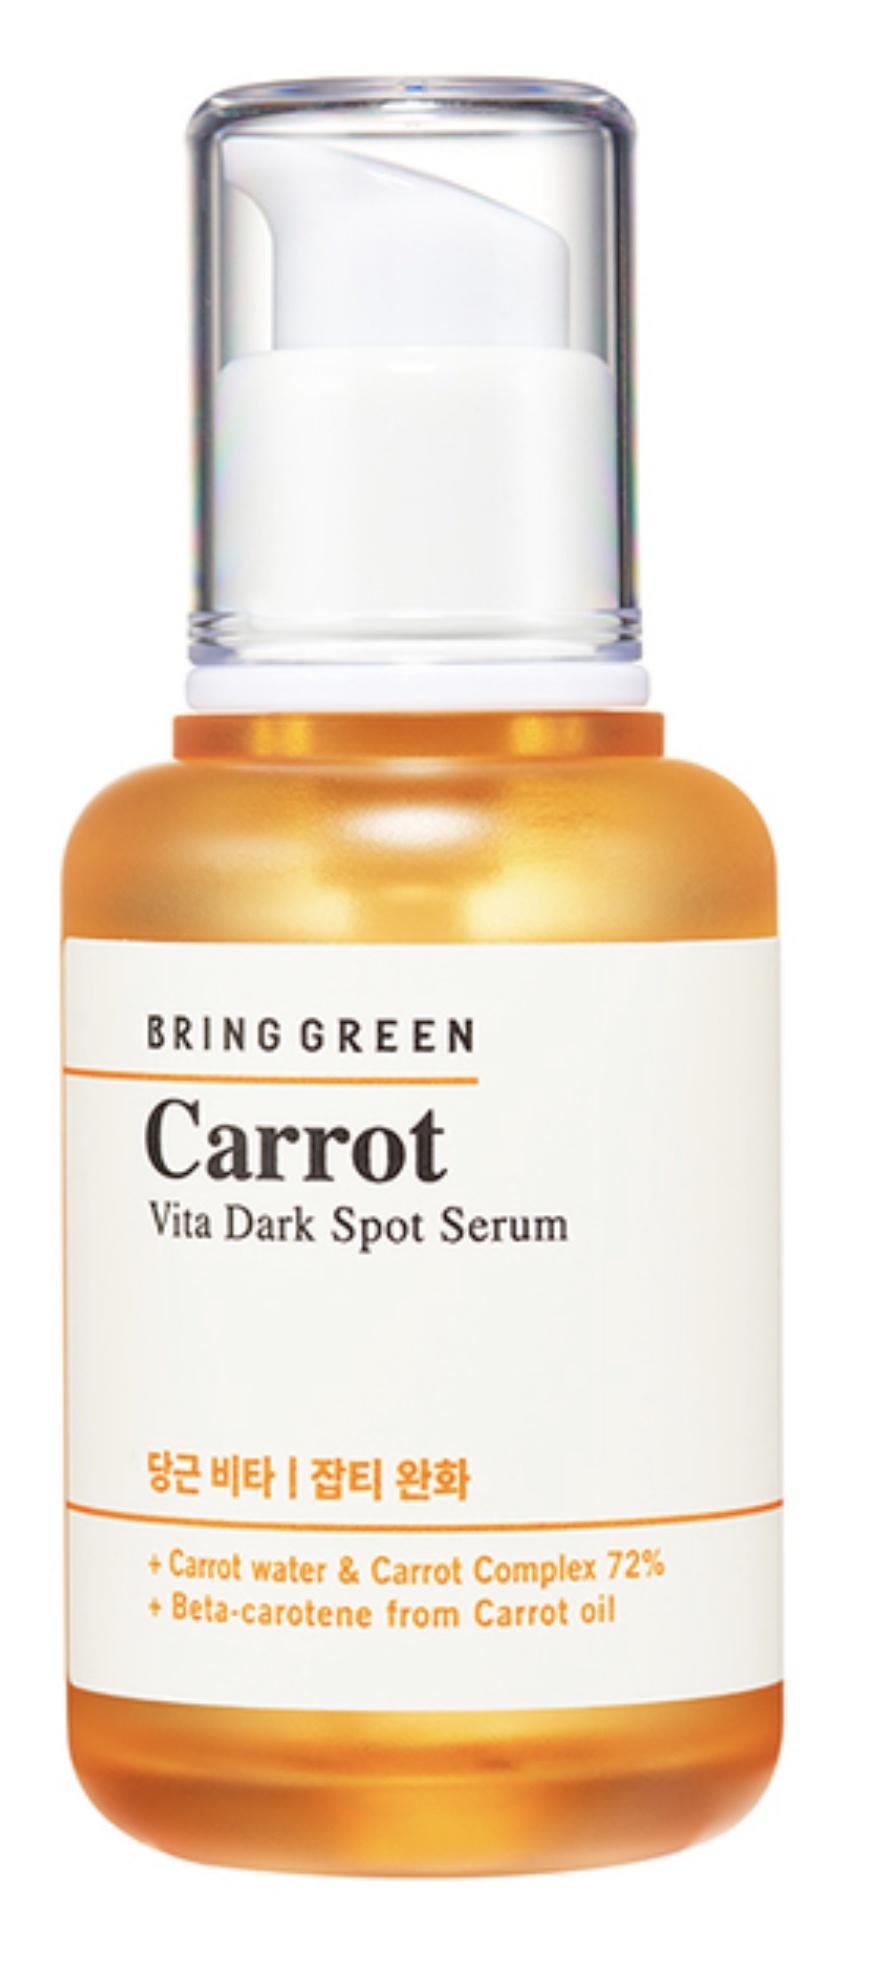 Bring Green Carrot Vita Dark Spot Serum